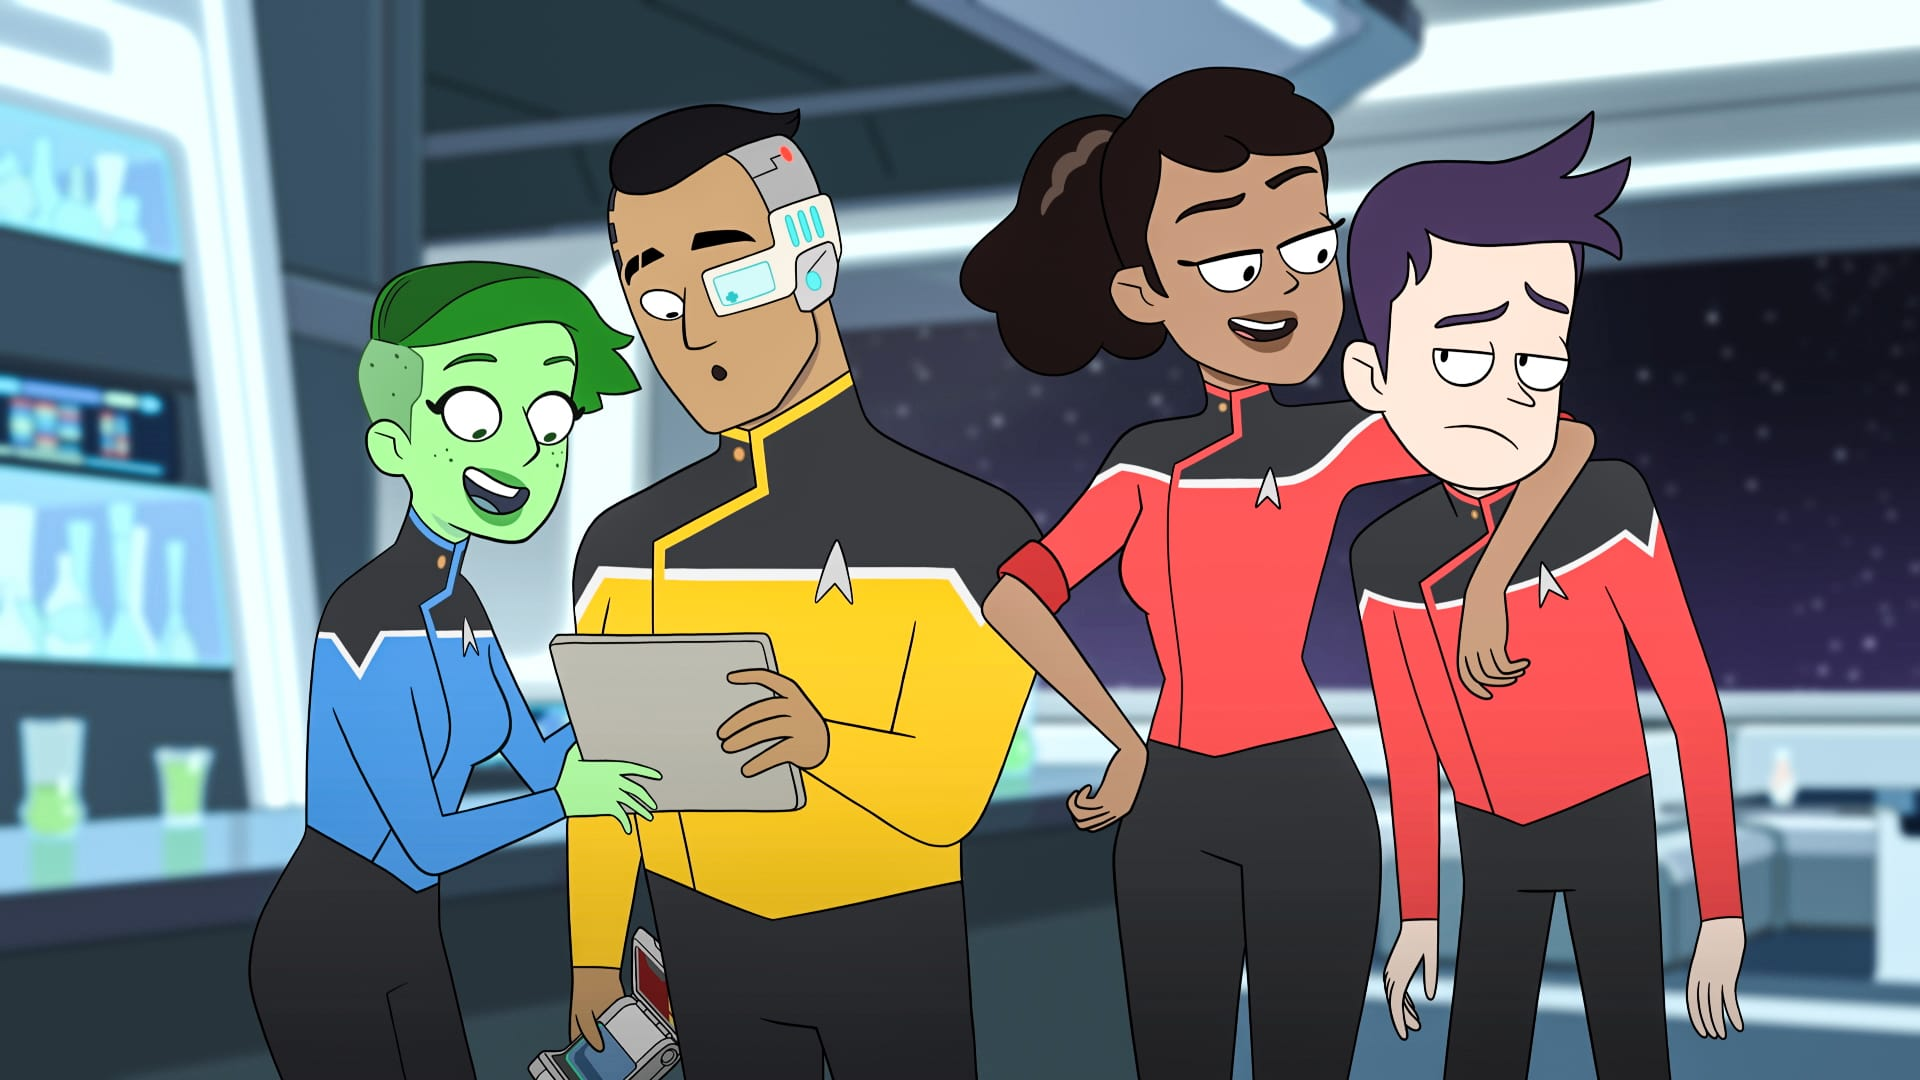 720p~ Star Trek: Lower Decks Season 1 Episode 3